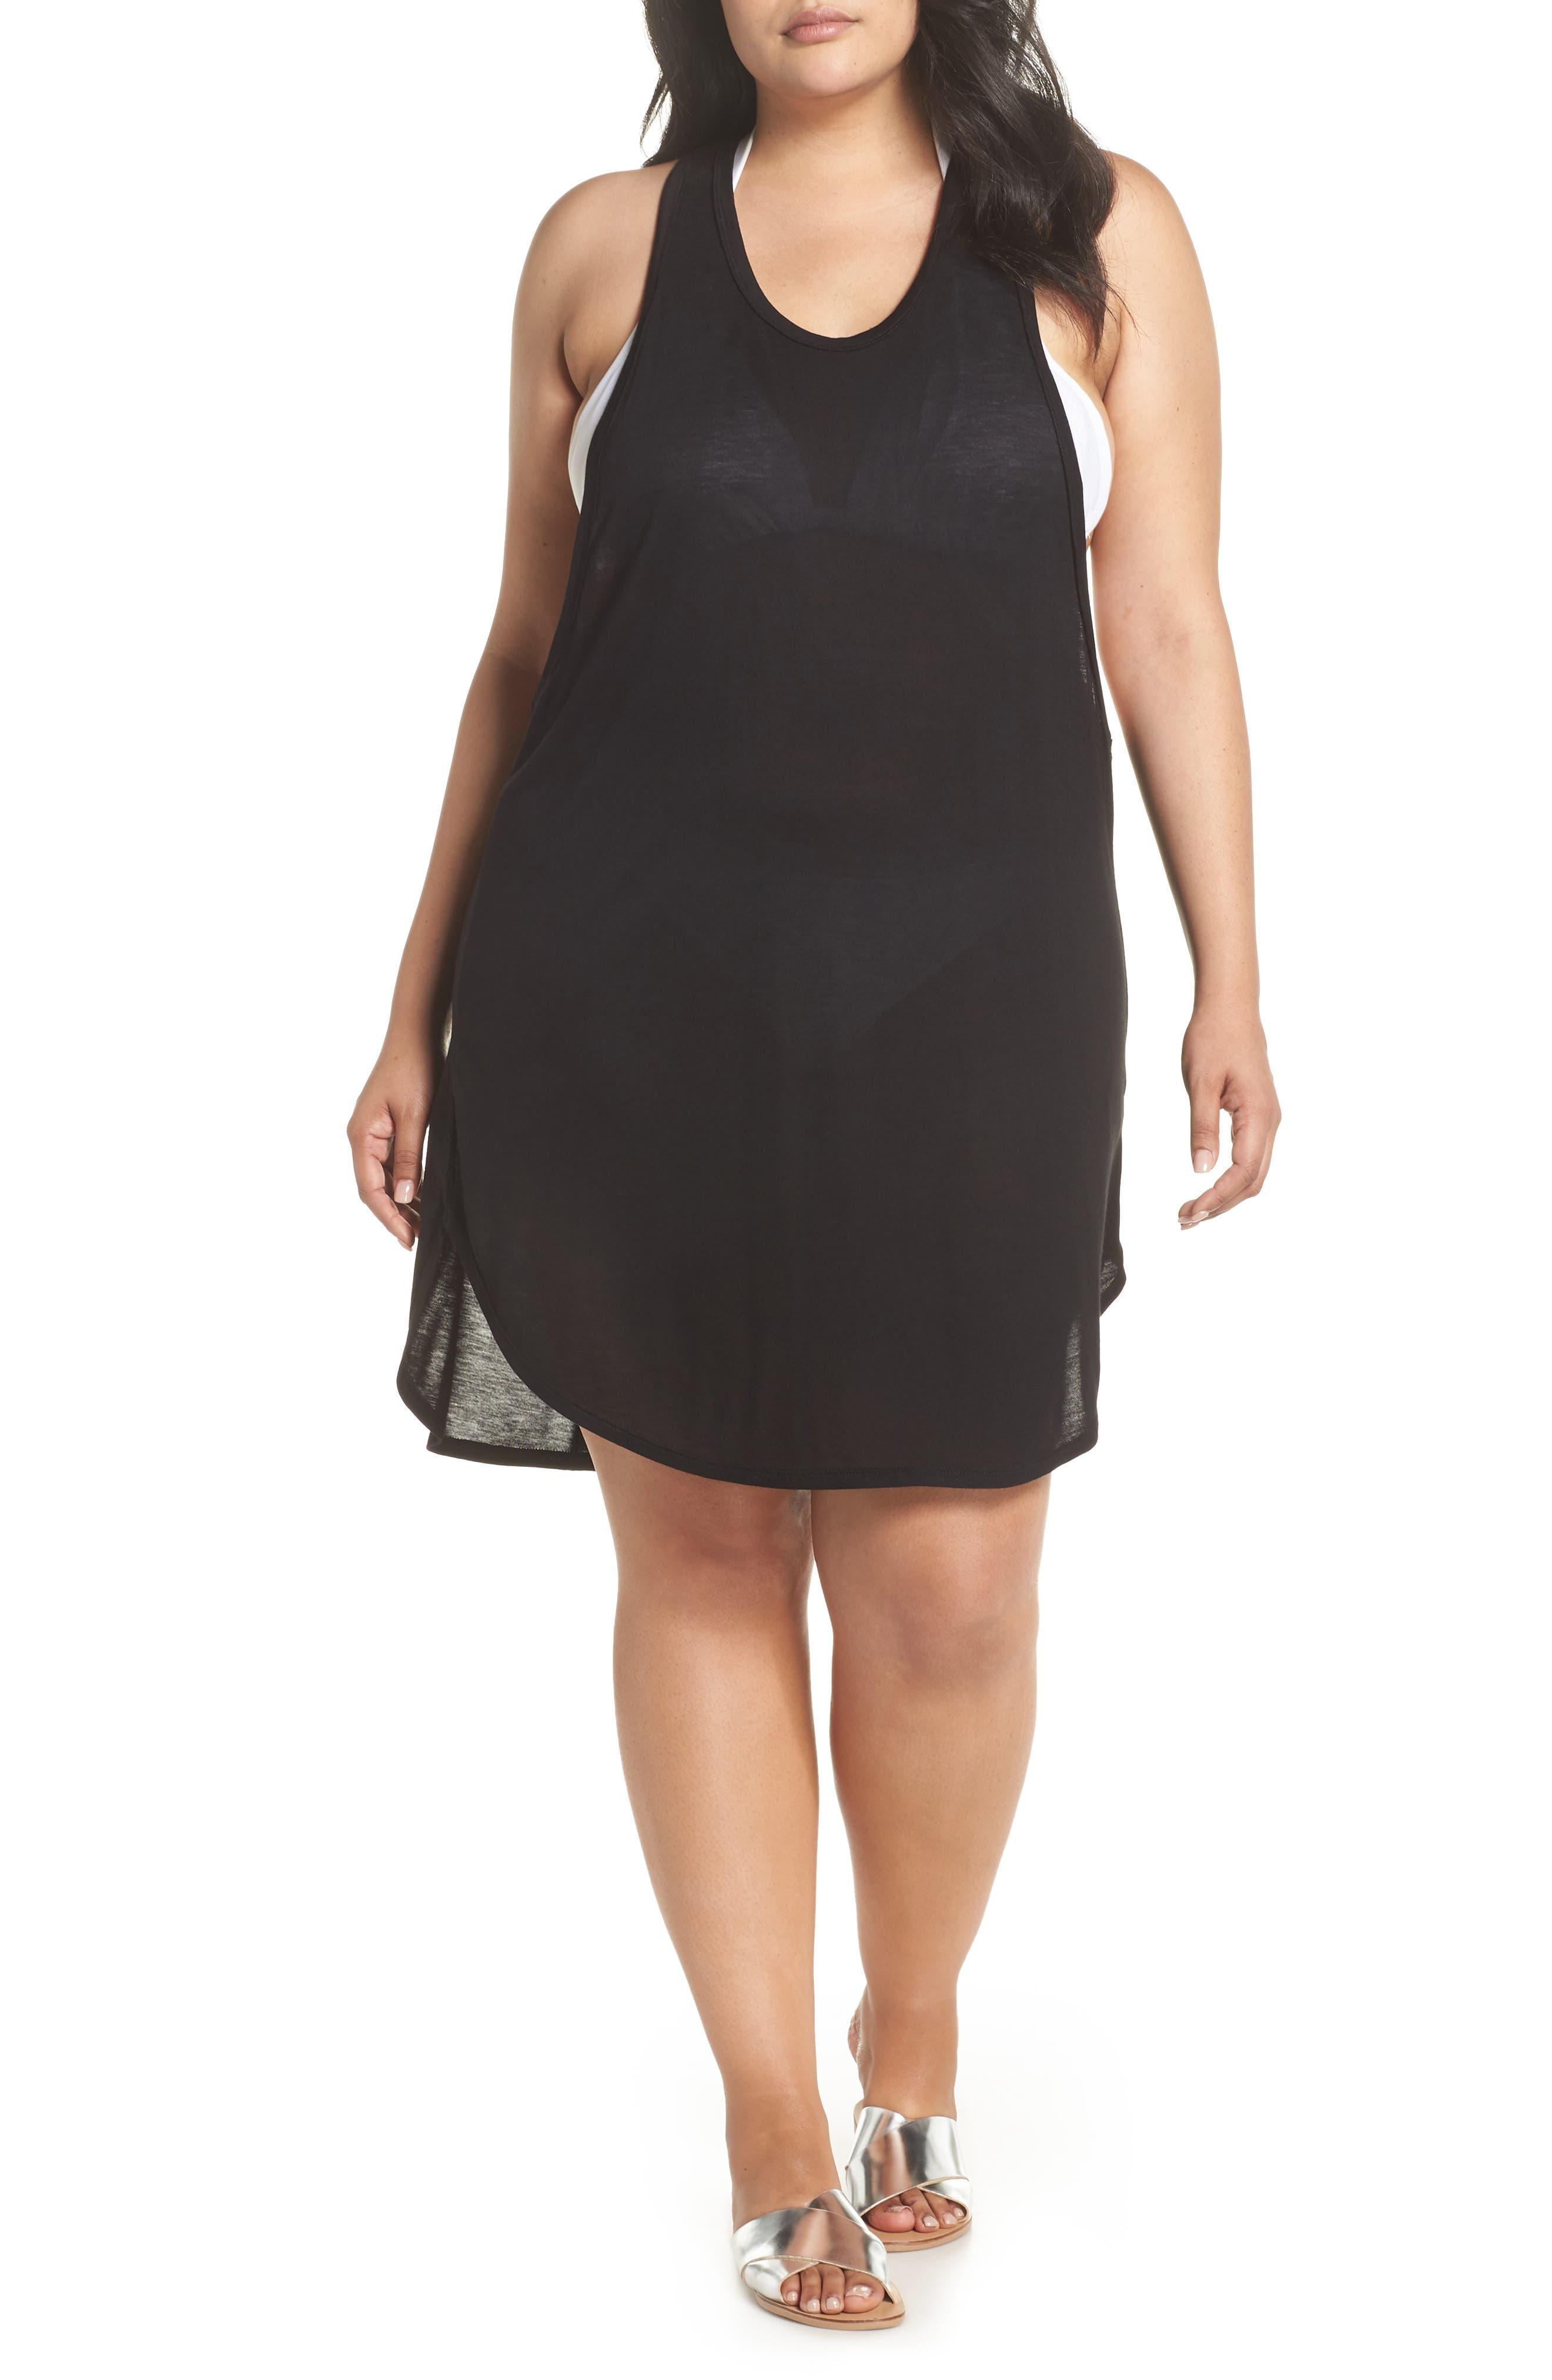 Racerback Cover-Up Tank Dress,                             Main thumbnail 1, color,                             BLACK